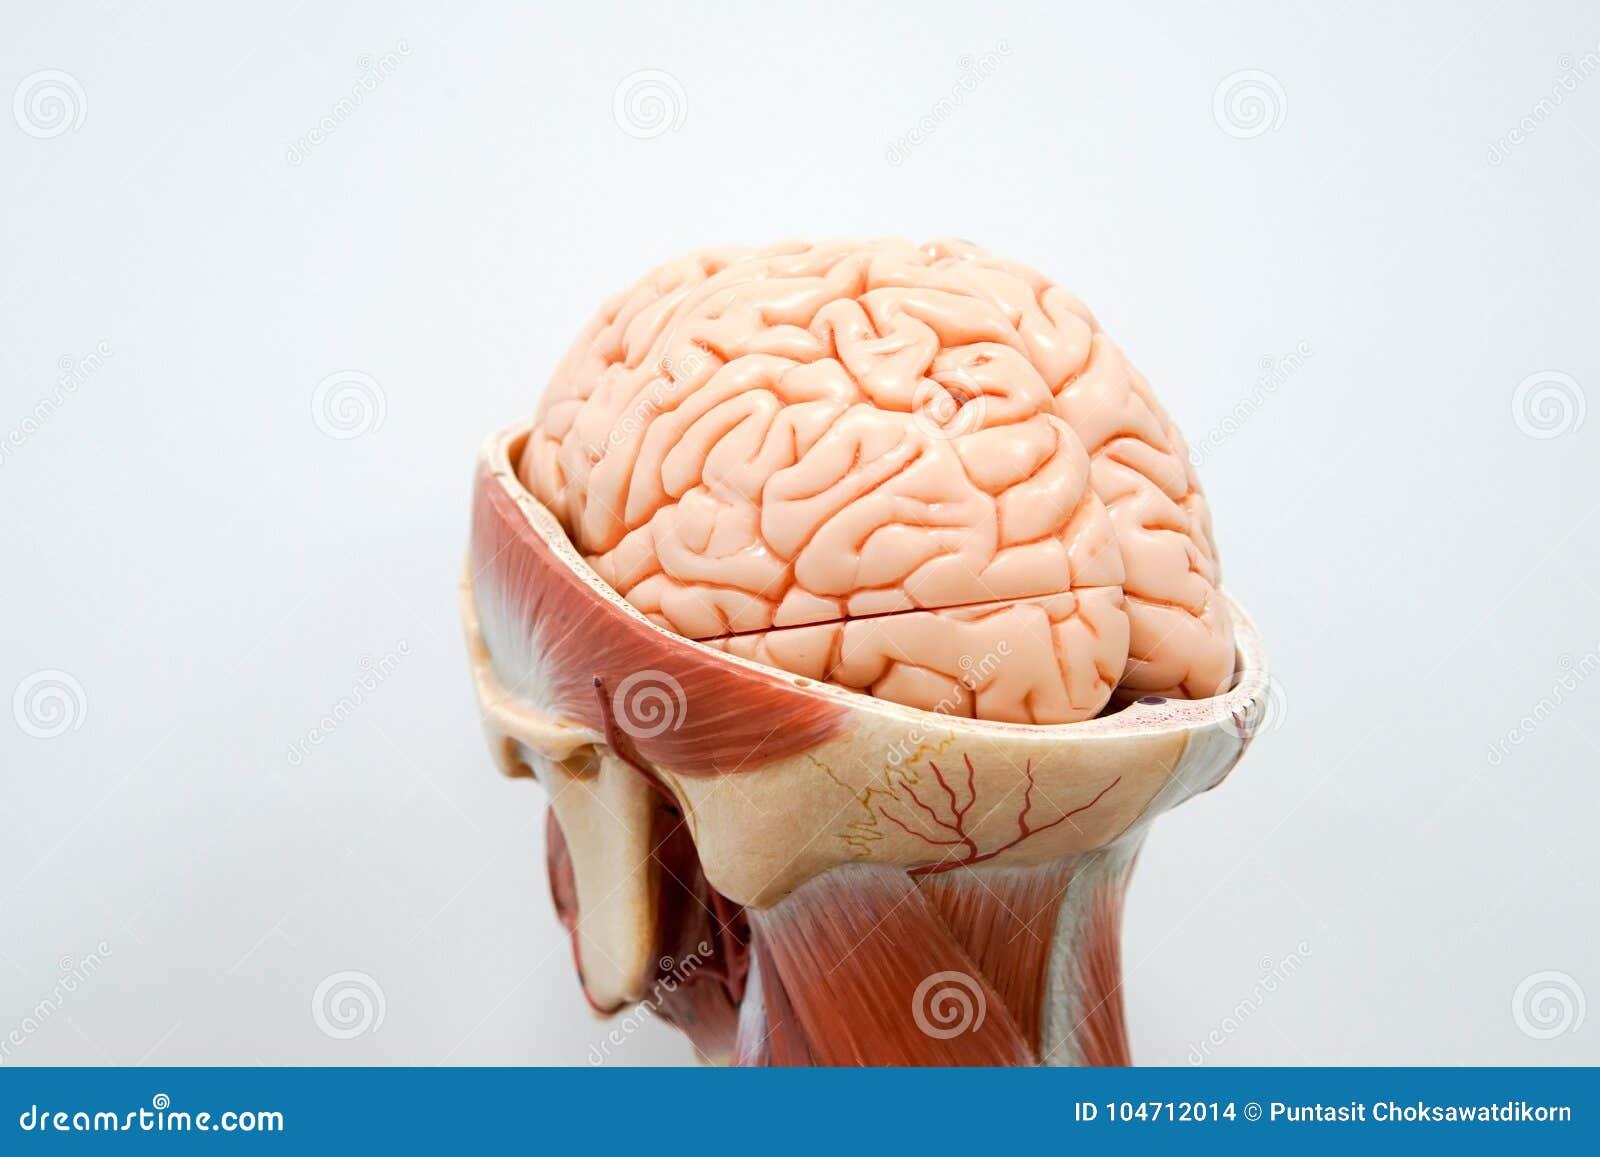 Human Brain Anatomy Model Stock Photo Image Of Diagram 104712014